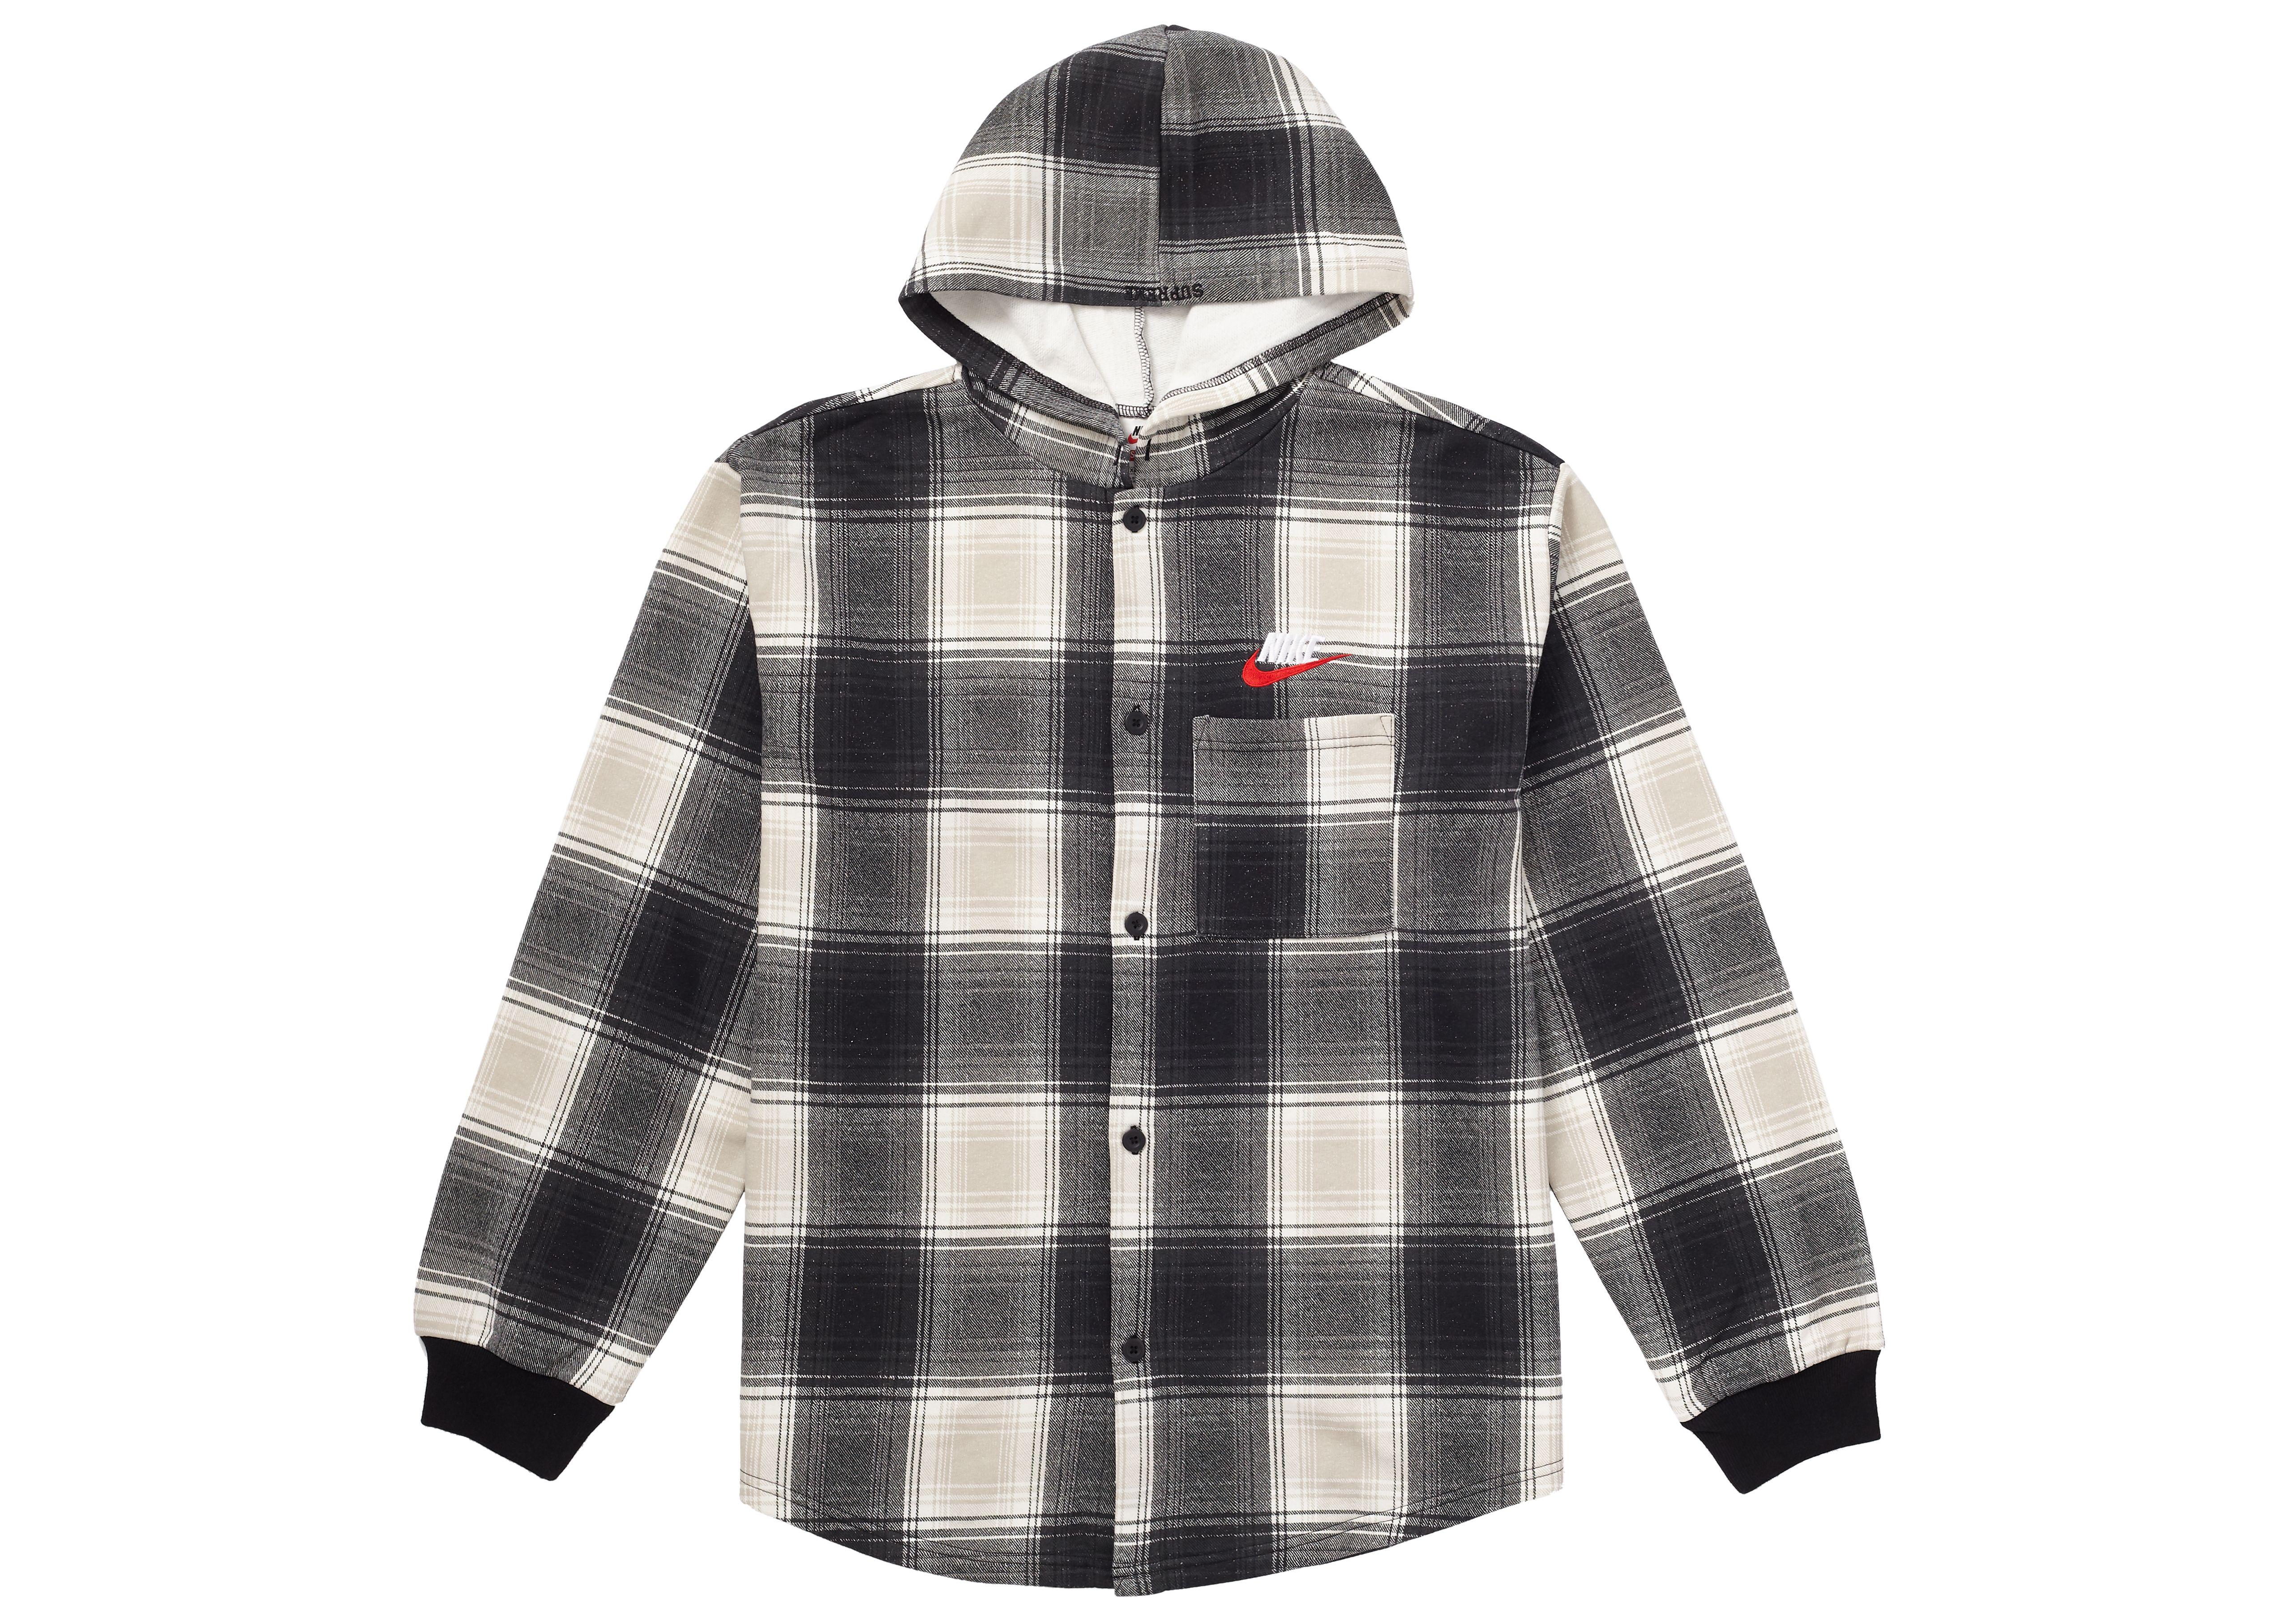 Supreme Nike Plaid Hooded Sweatshirt Black Supreme Cloth Black Sweatshirts Hooded Sweatshirts Sweatshirts [ 3627 x 5077 Pixel ]